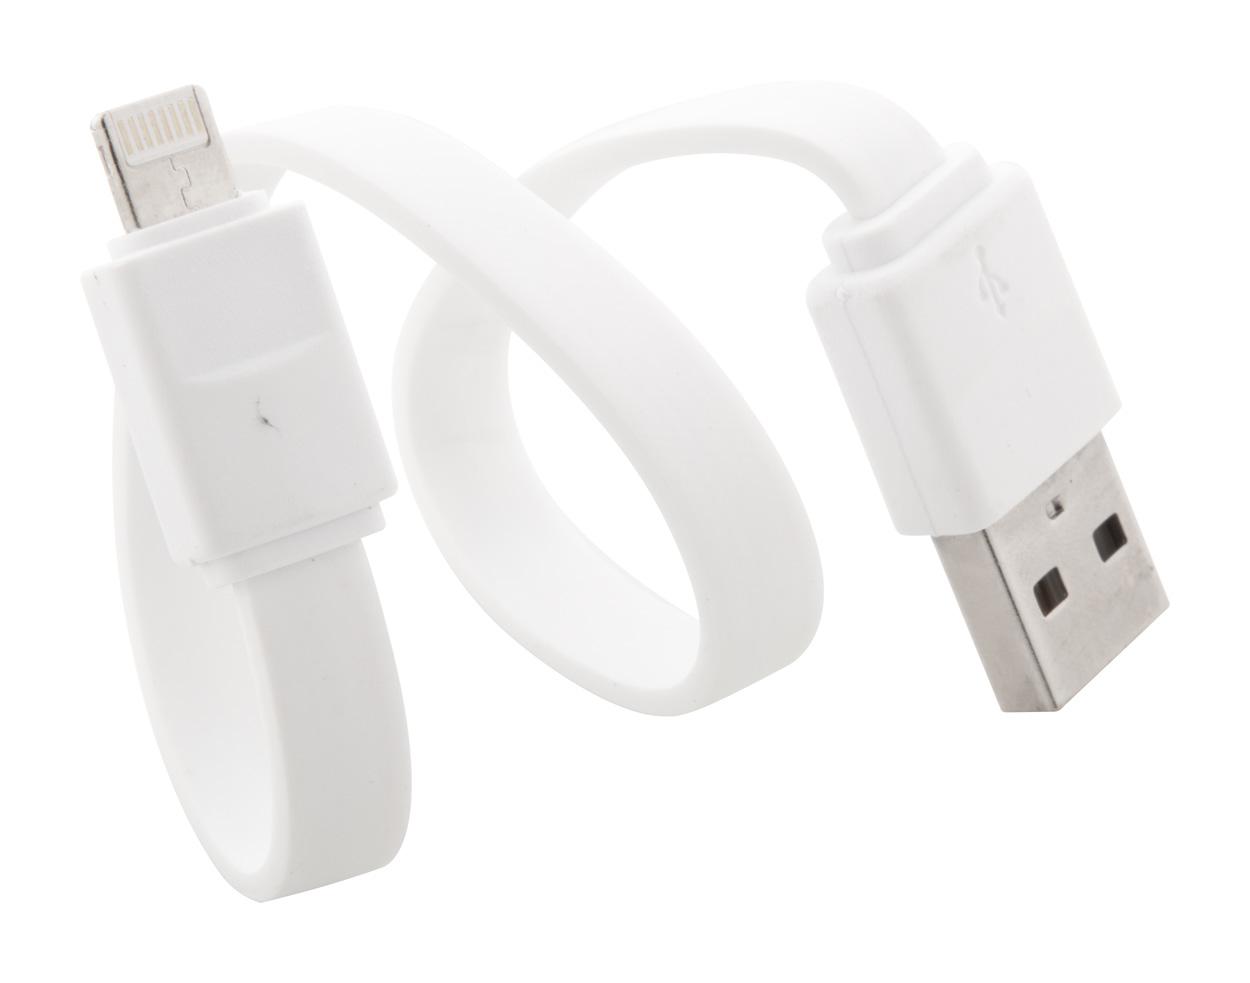 Stash USB charger cable